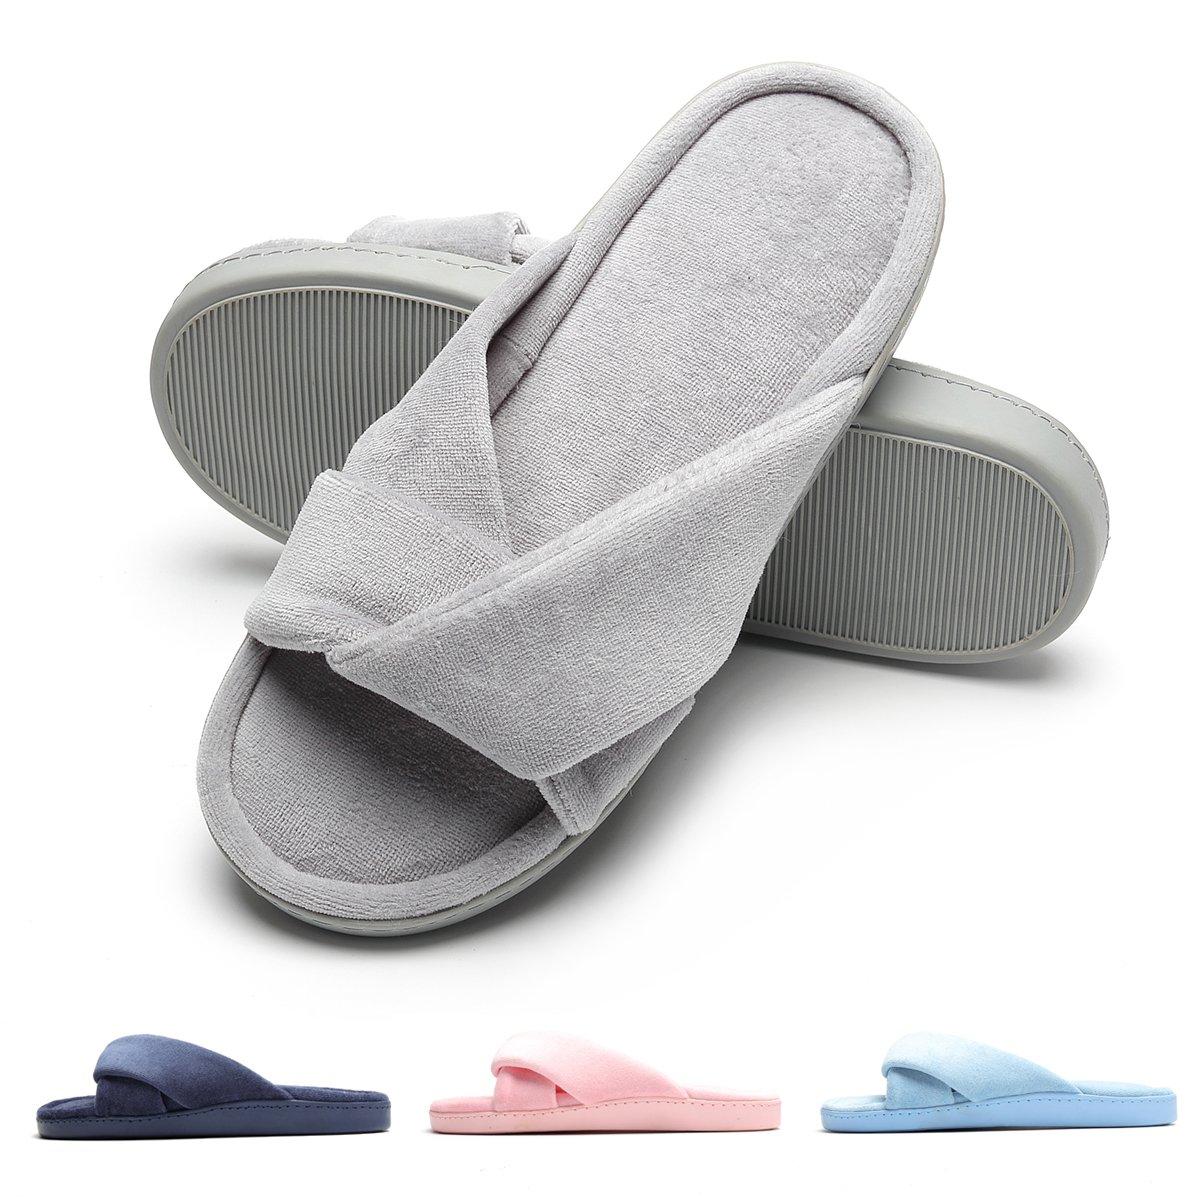 Bedroom Slippers Comfort Four Season Classy Indoor Spa Slide Shoes Gray M